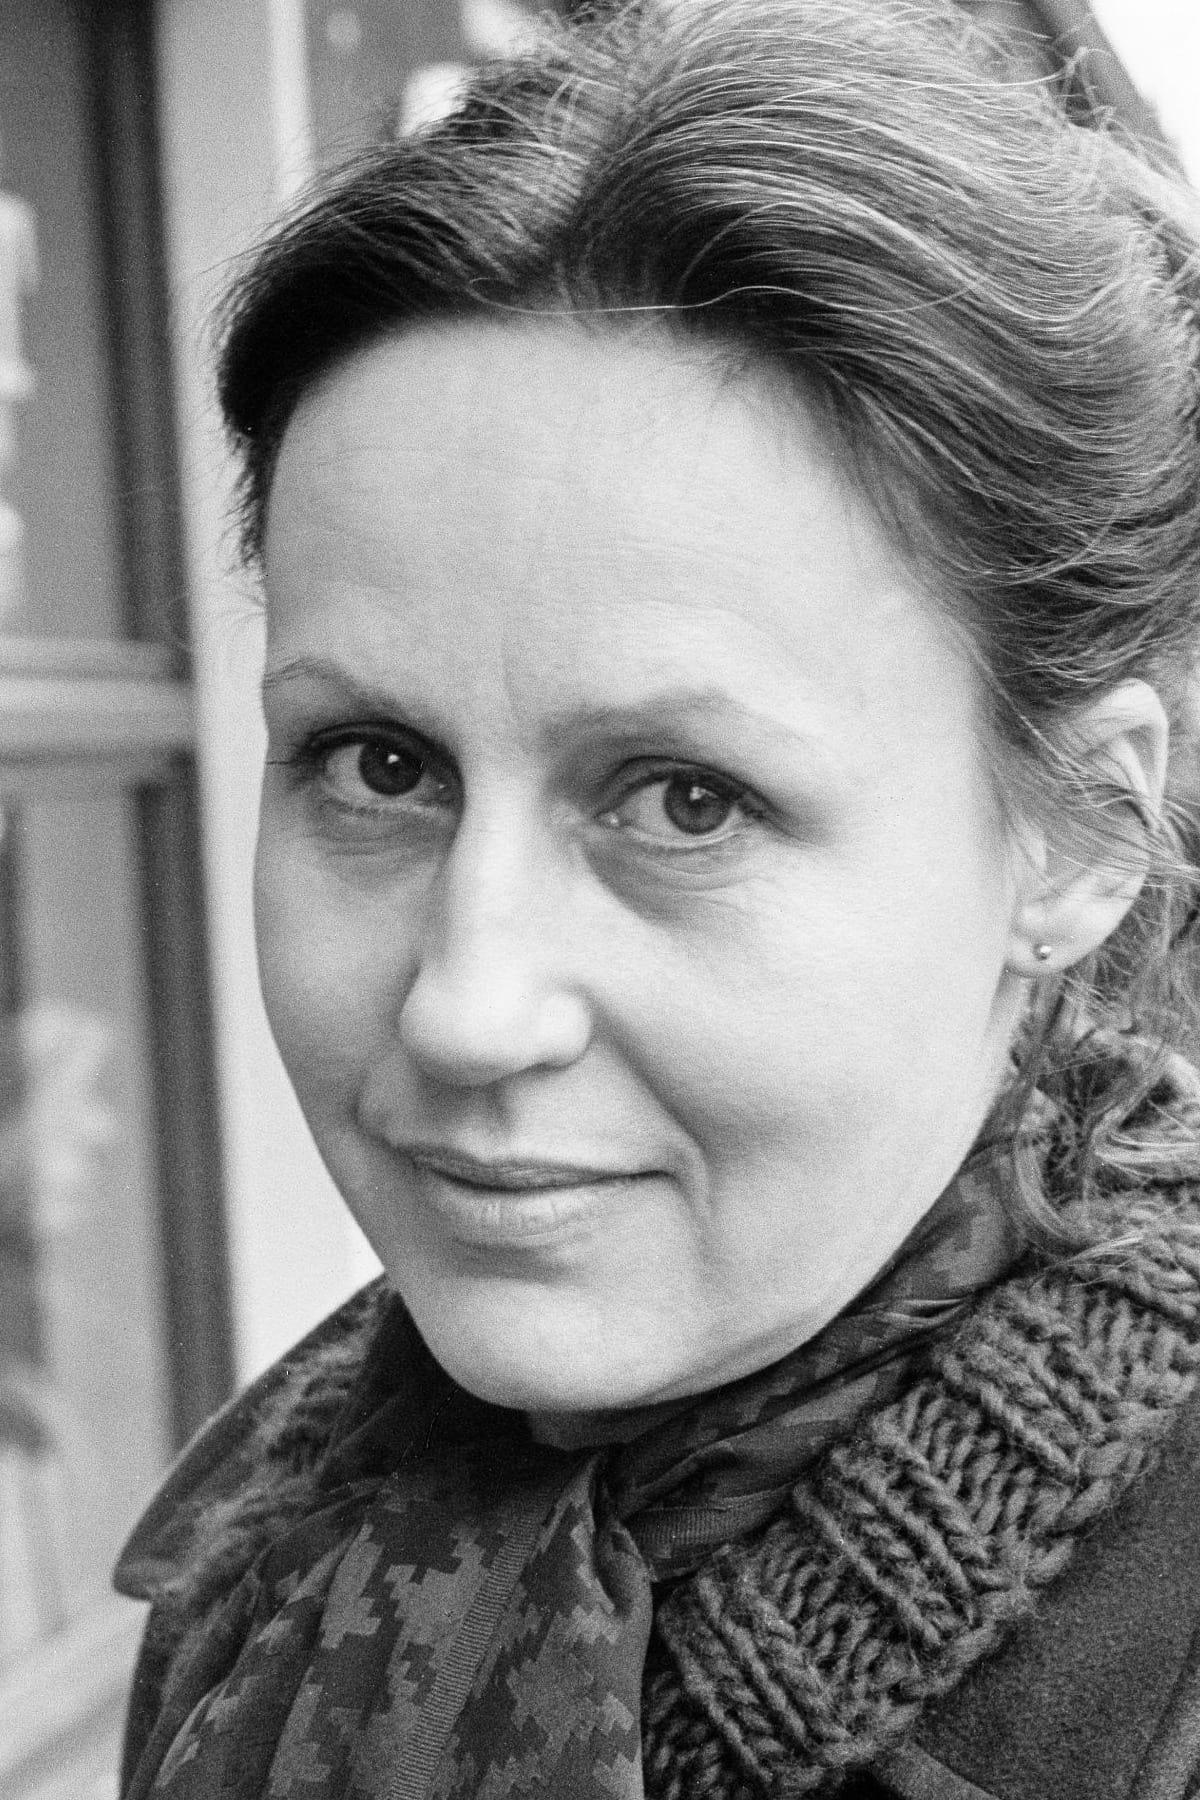 Gisela Stein